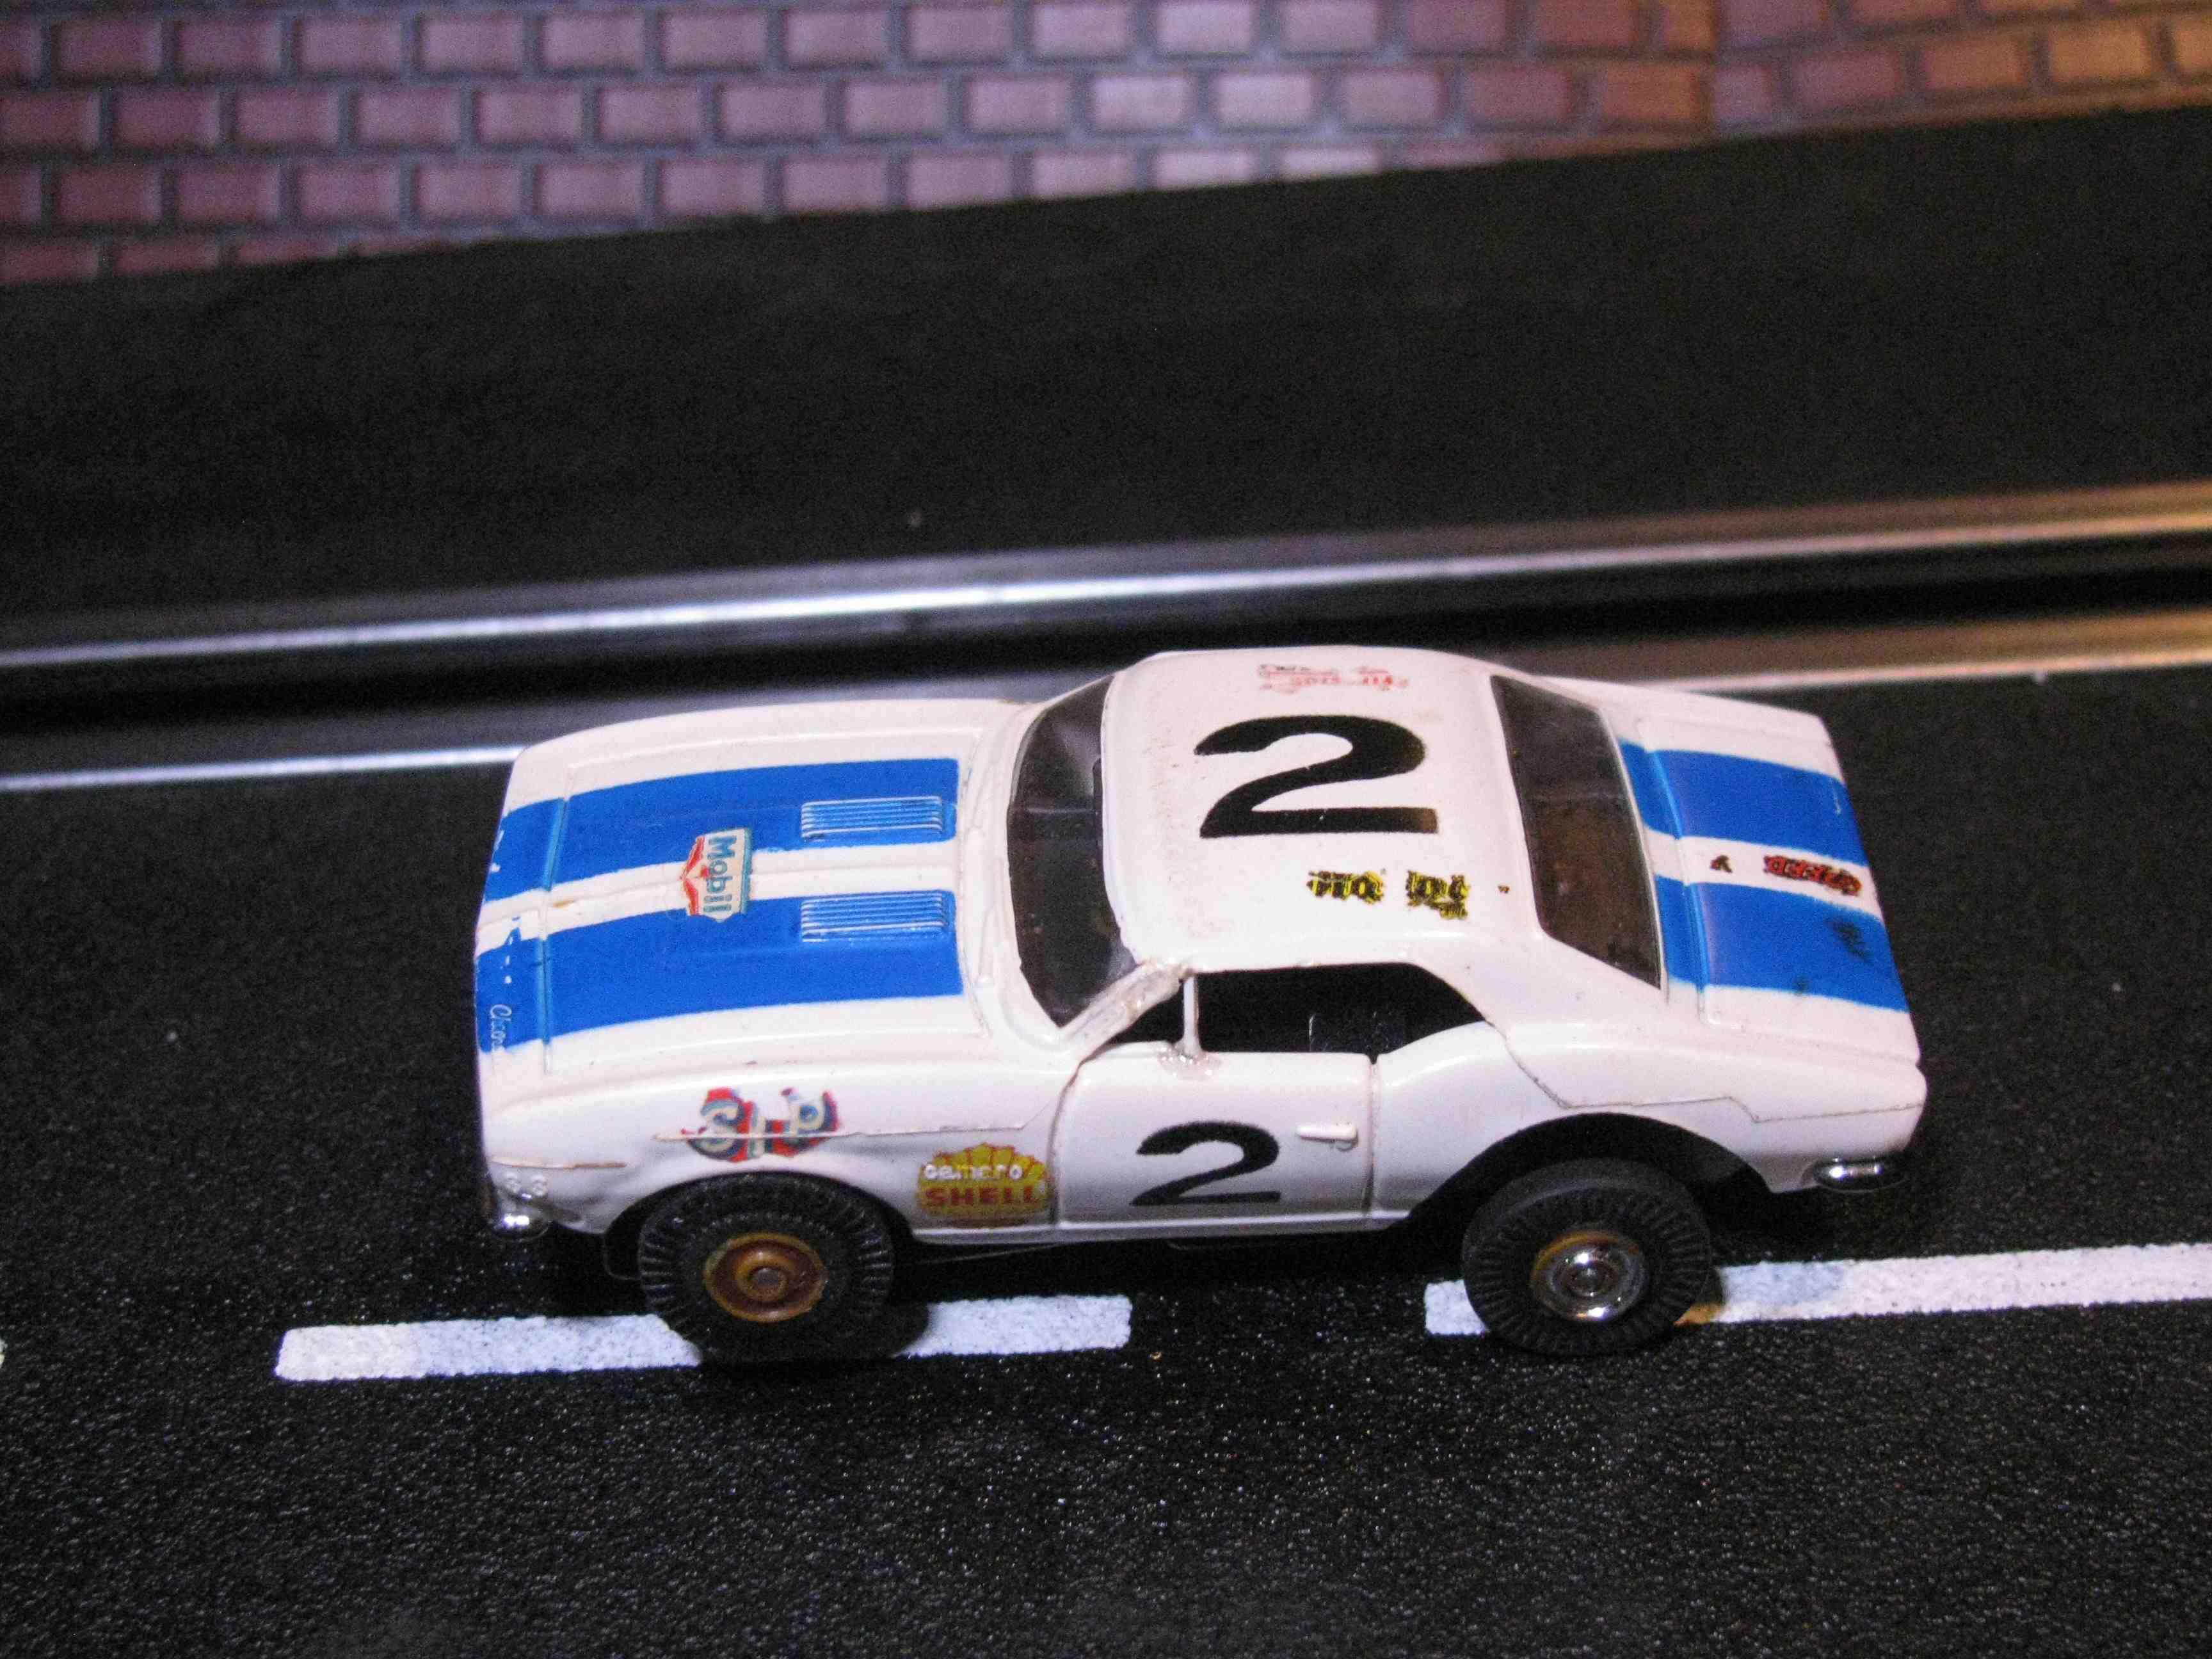 Vintage ho slot cars for sale royal vegas mobile casino no deposit bonus